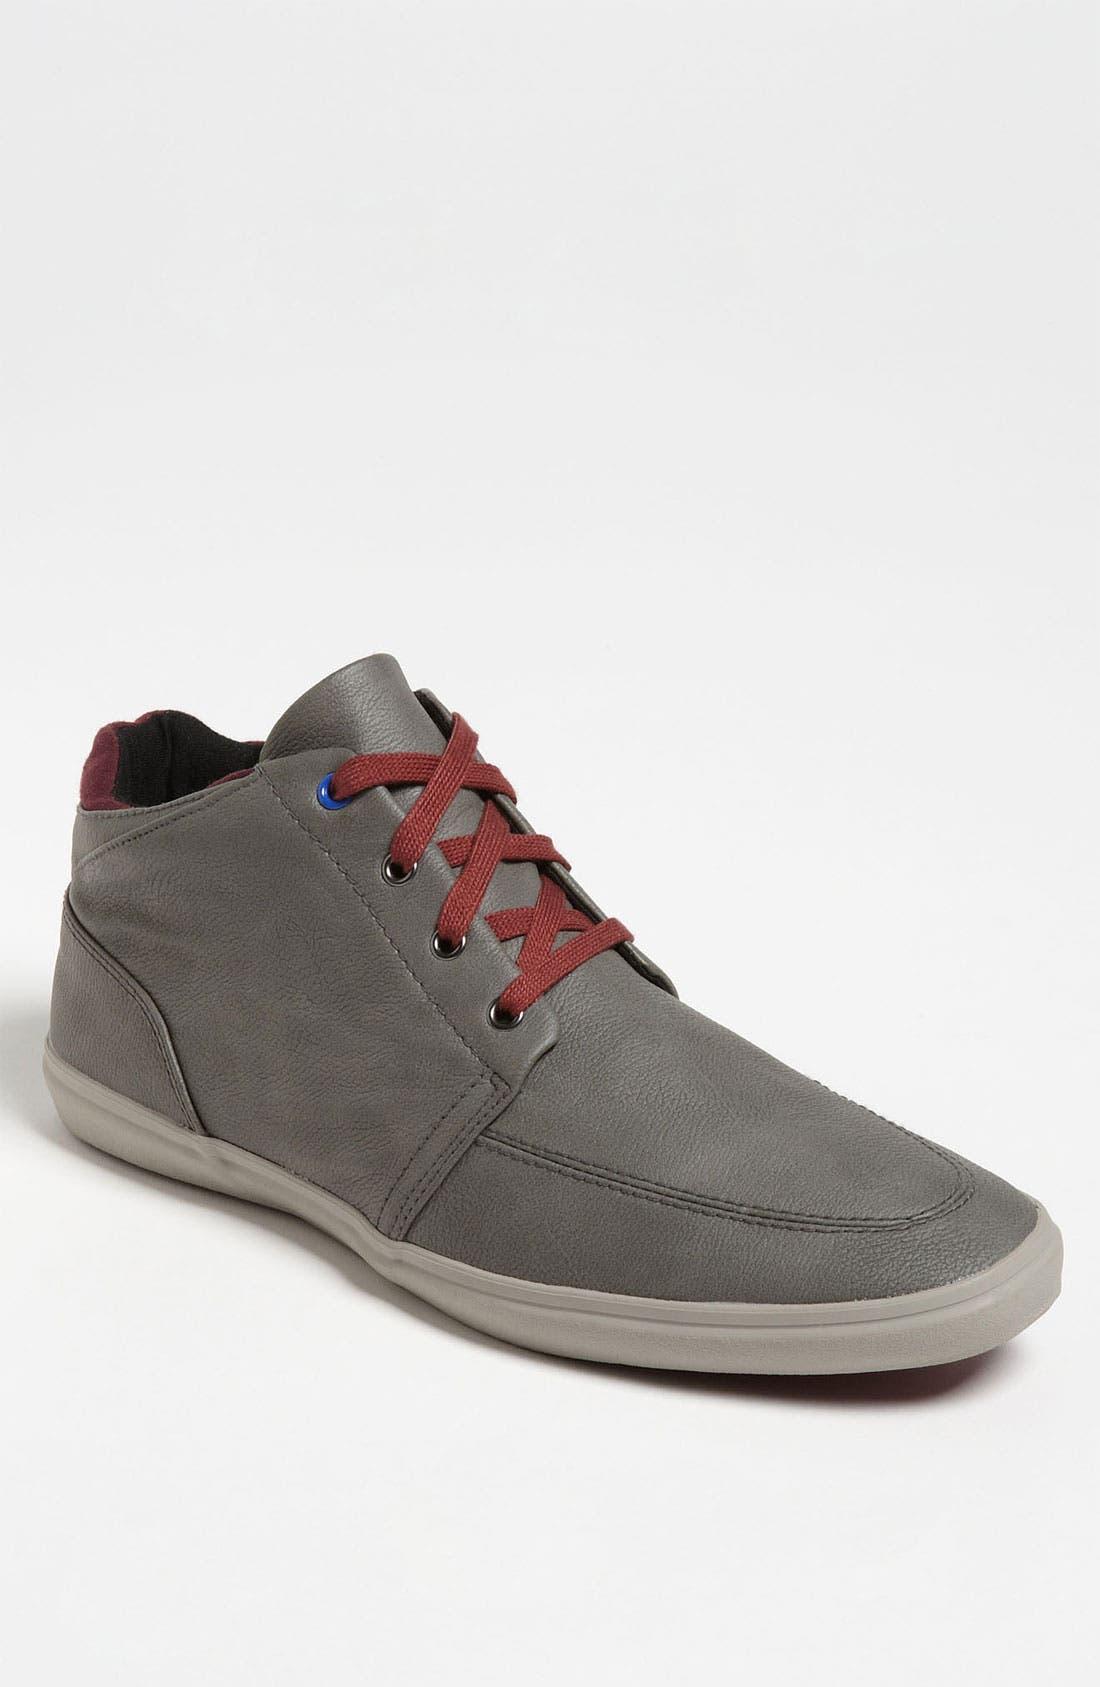 Main Image - ALDO 'Murri' High Top Sneaker